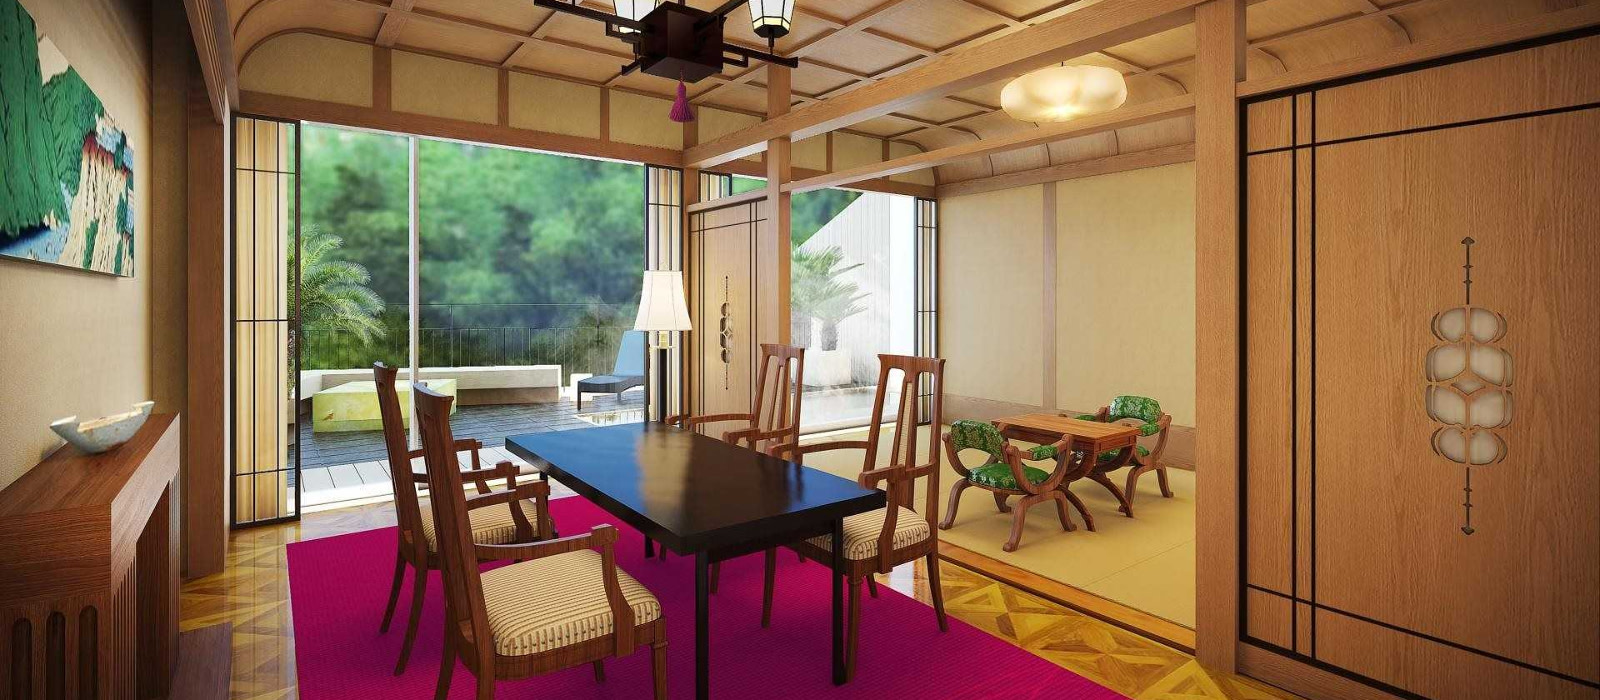 Hotel Hakone Kowakien Tenyu Ryokan Japan